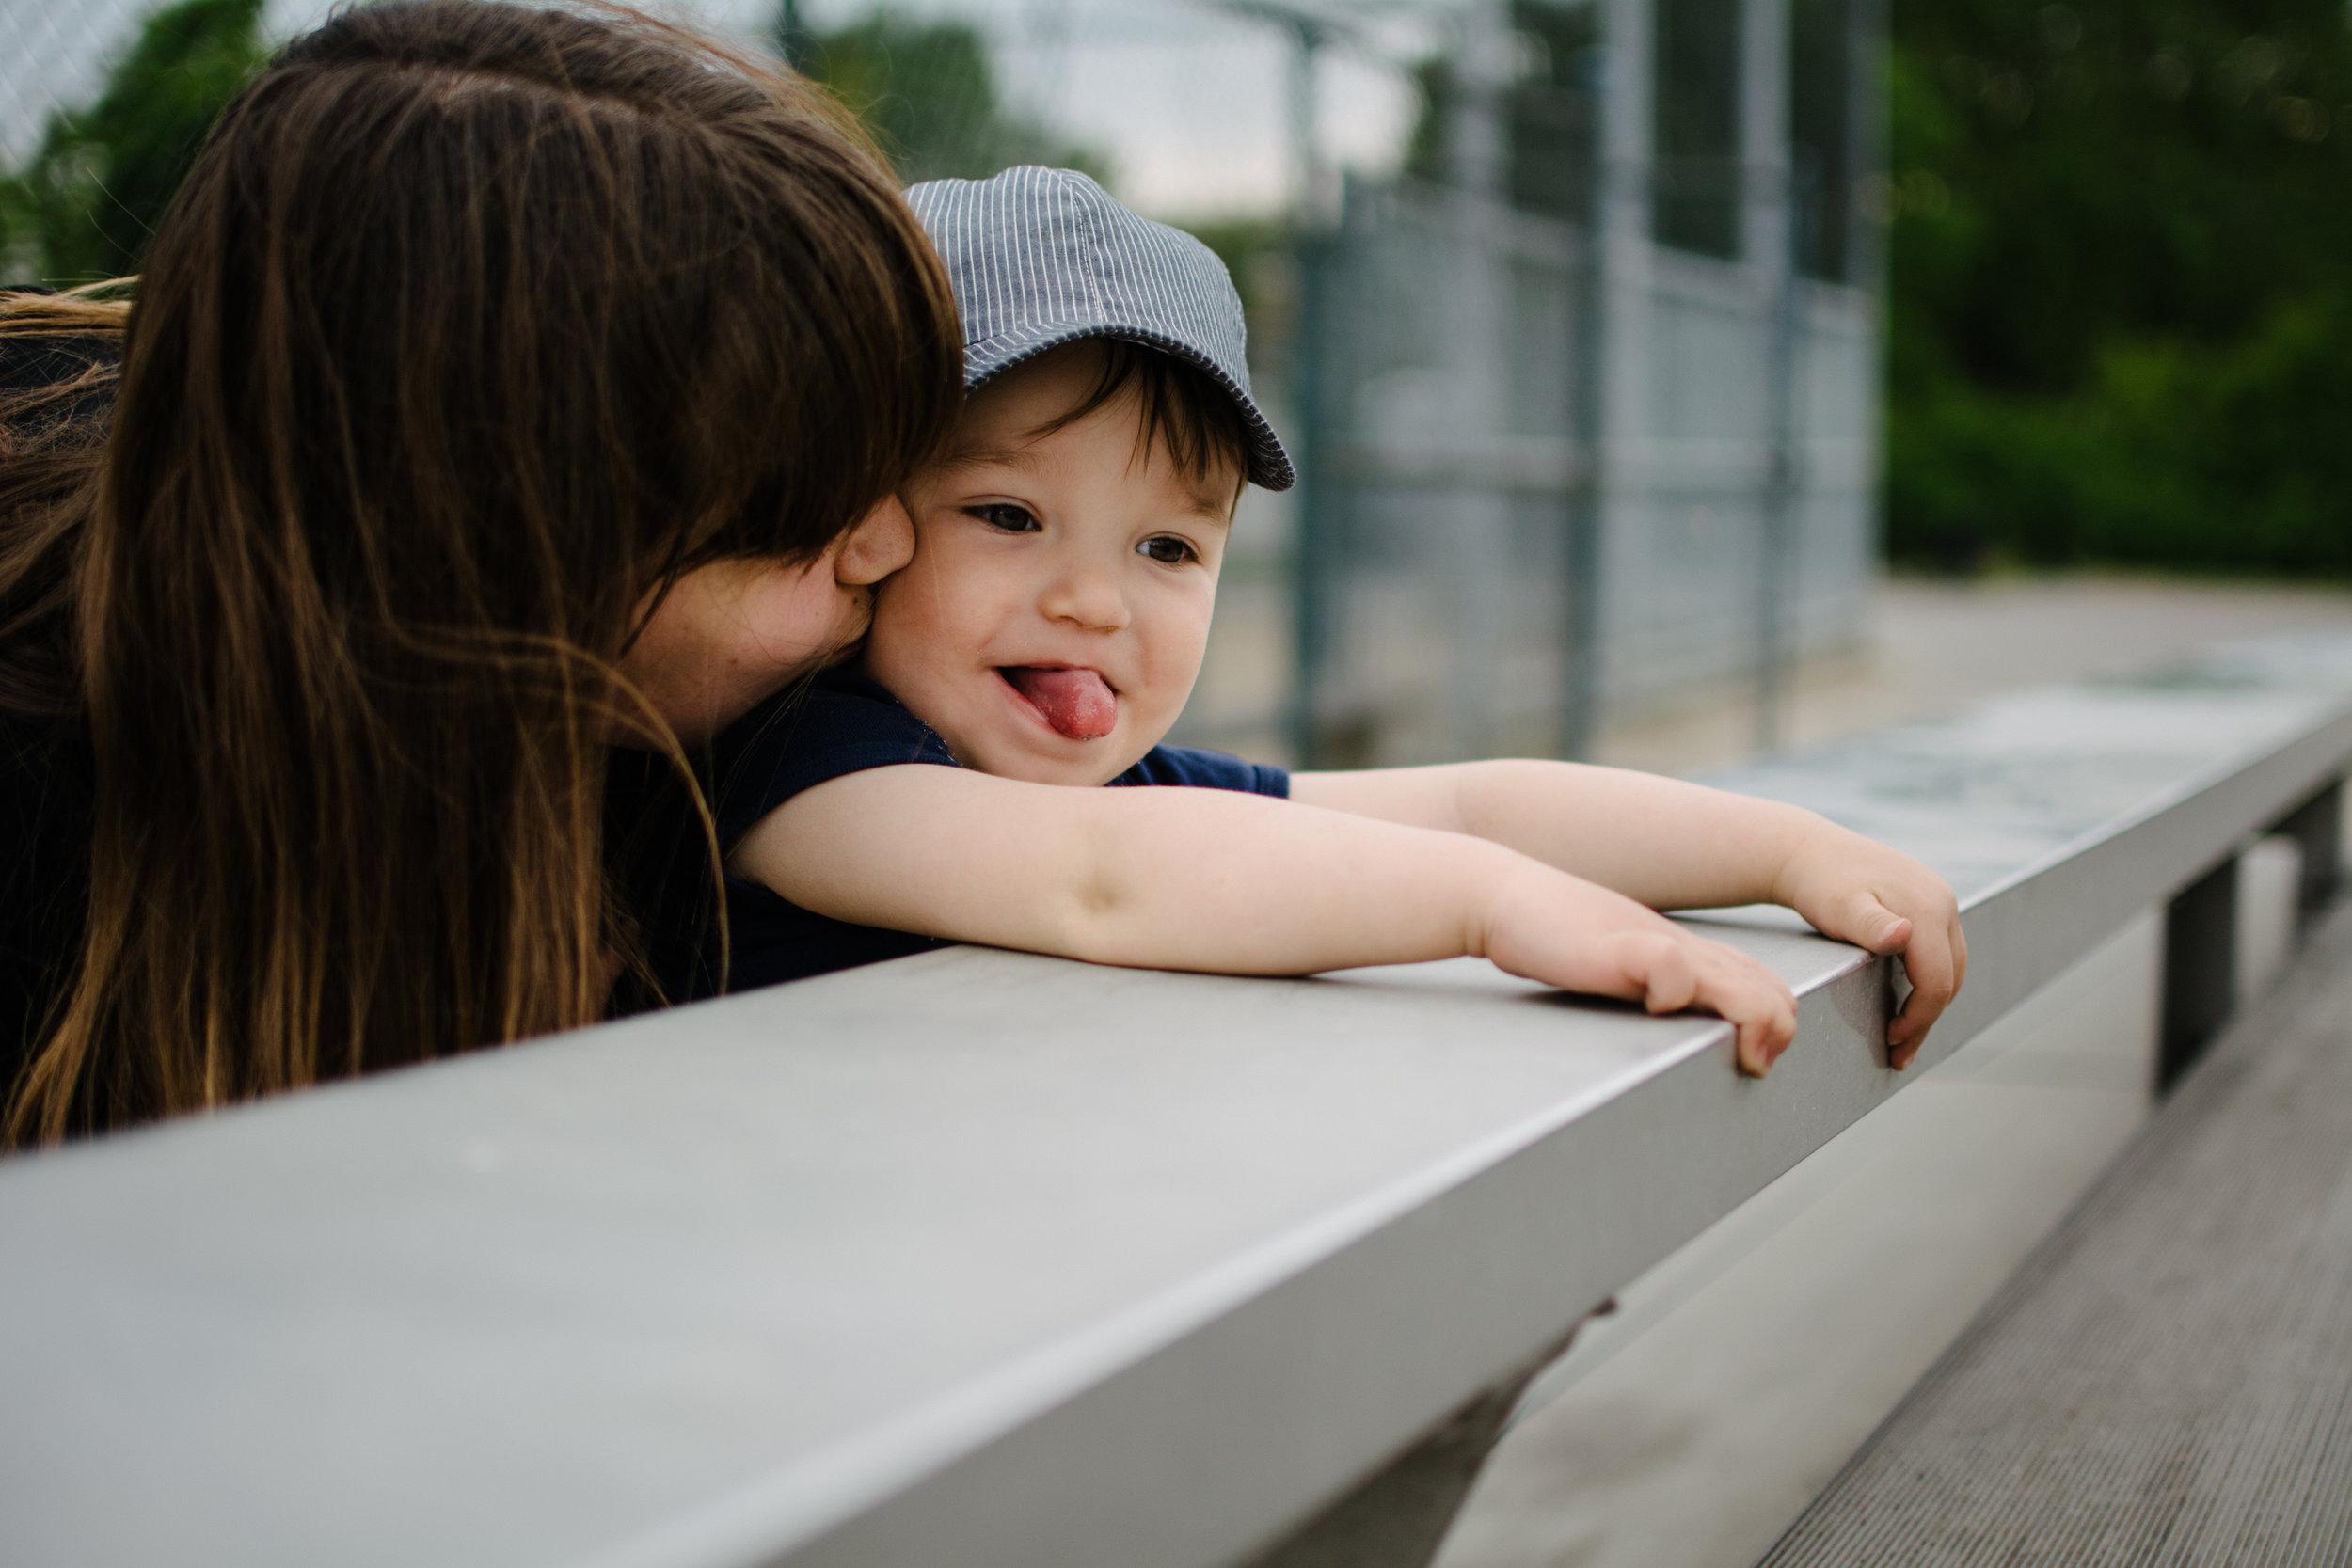 ete_photographe-famille-lifestyle-montreal-4.jpg